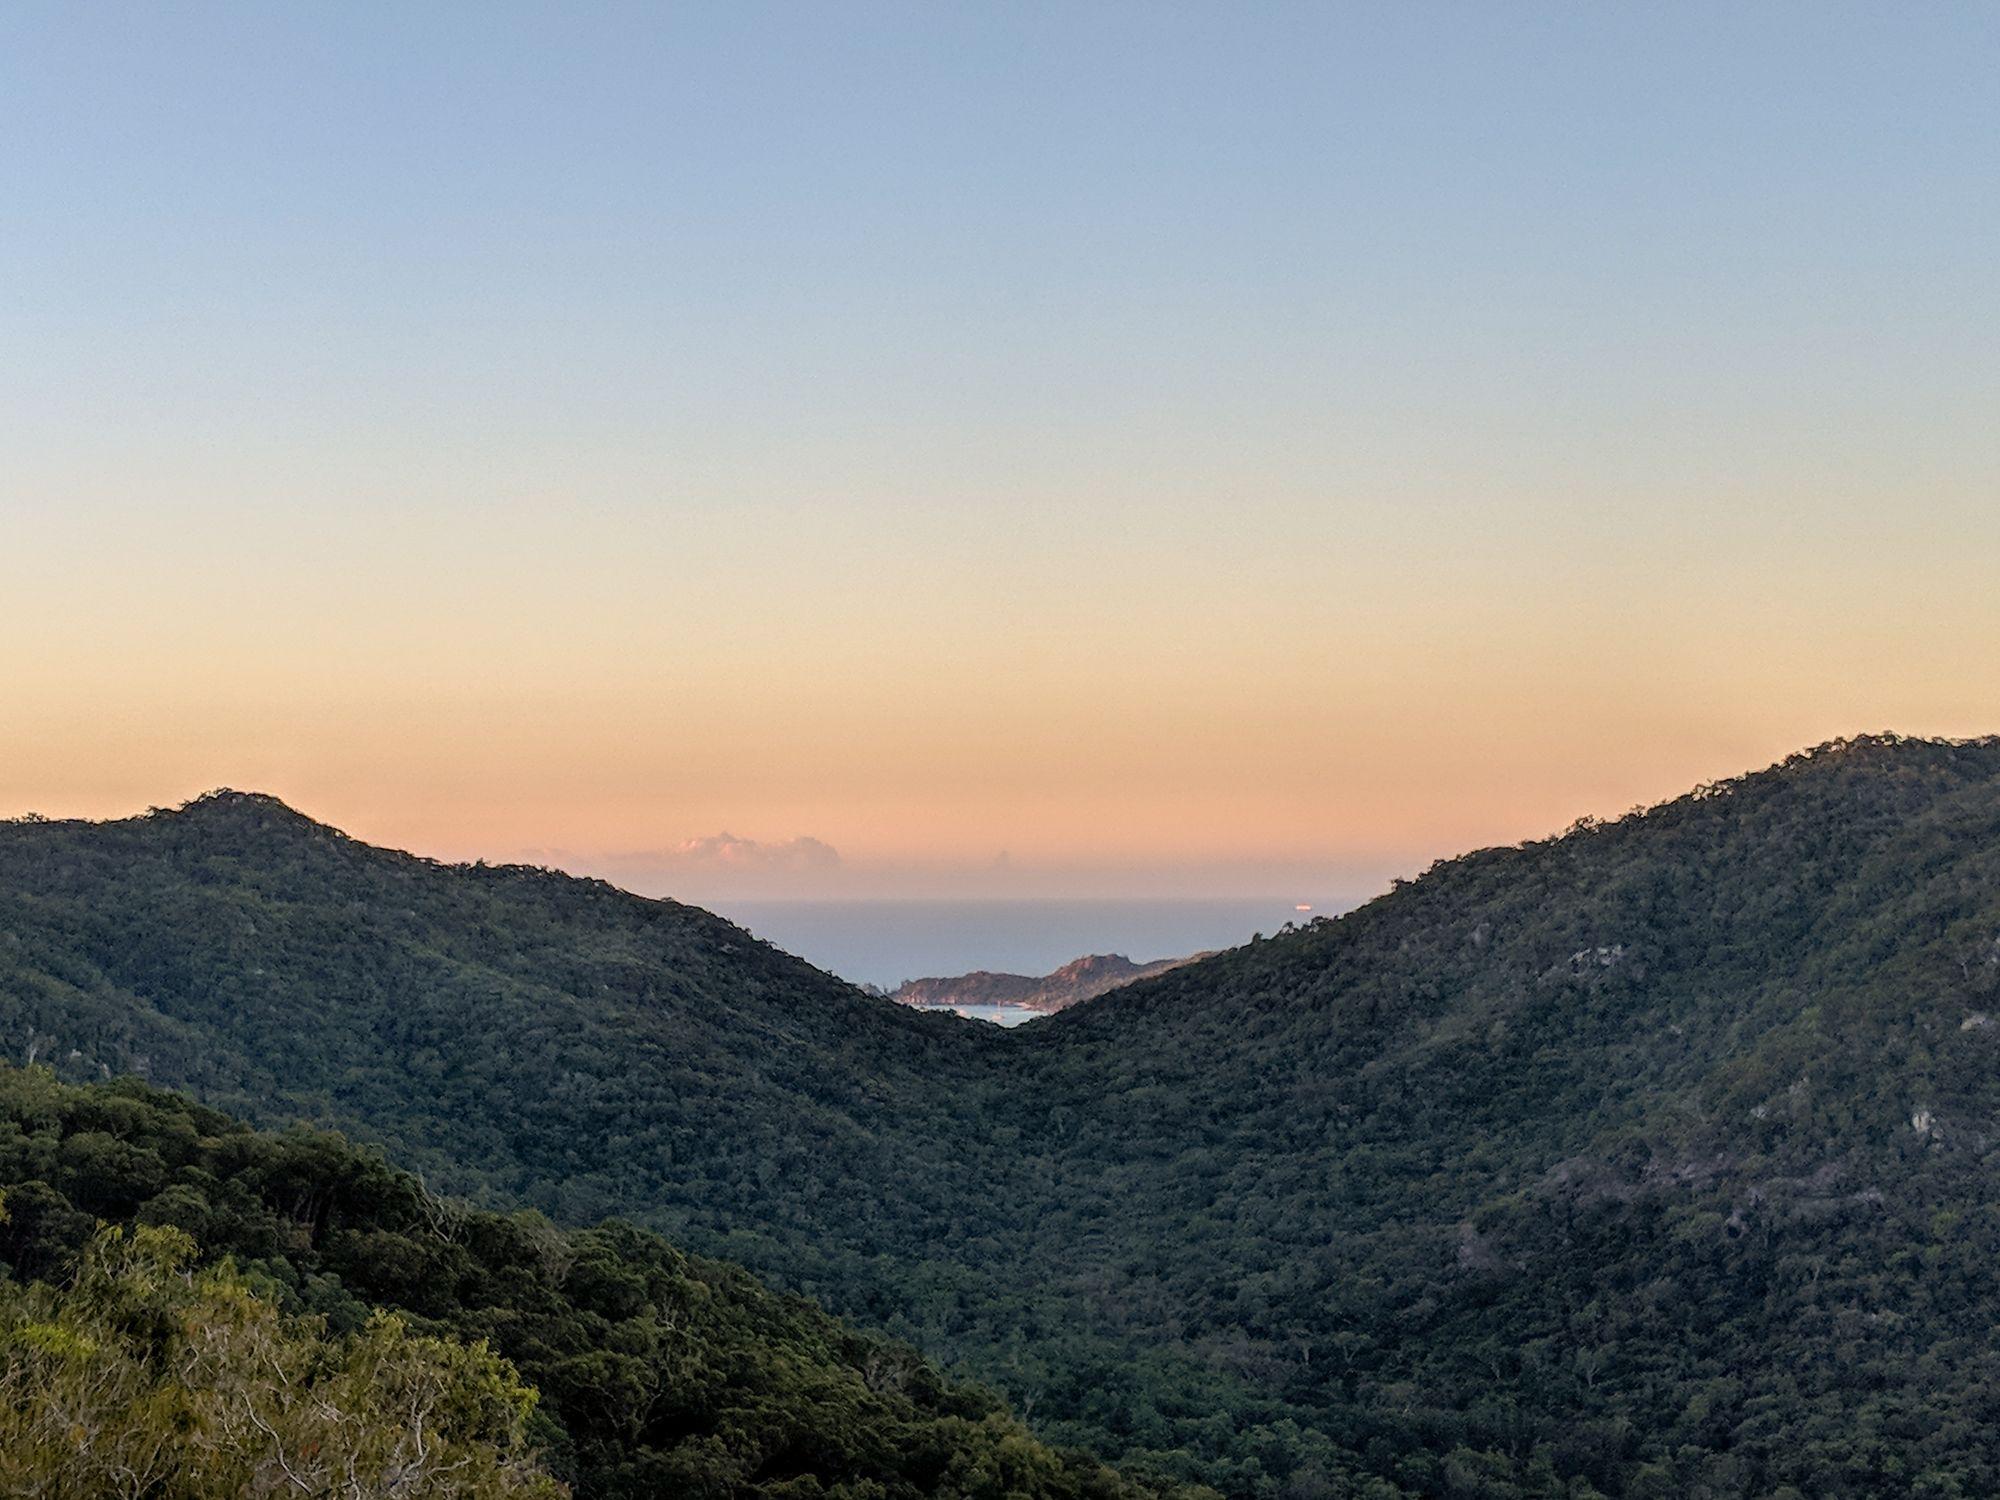 pride rock sunset valley